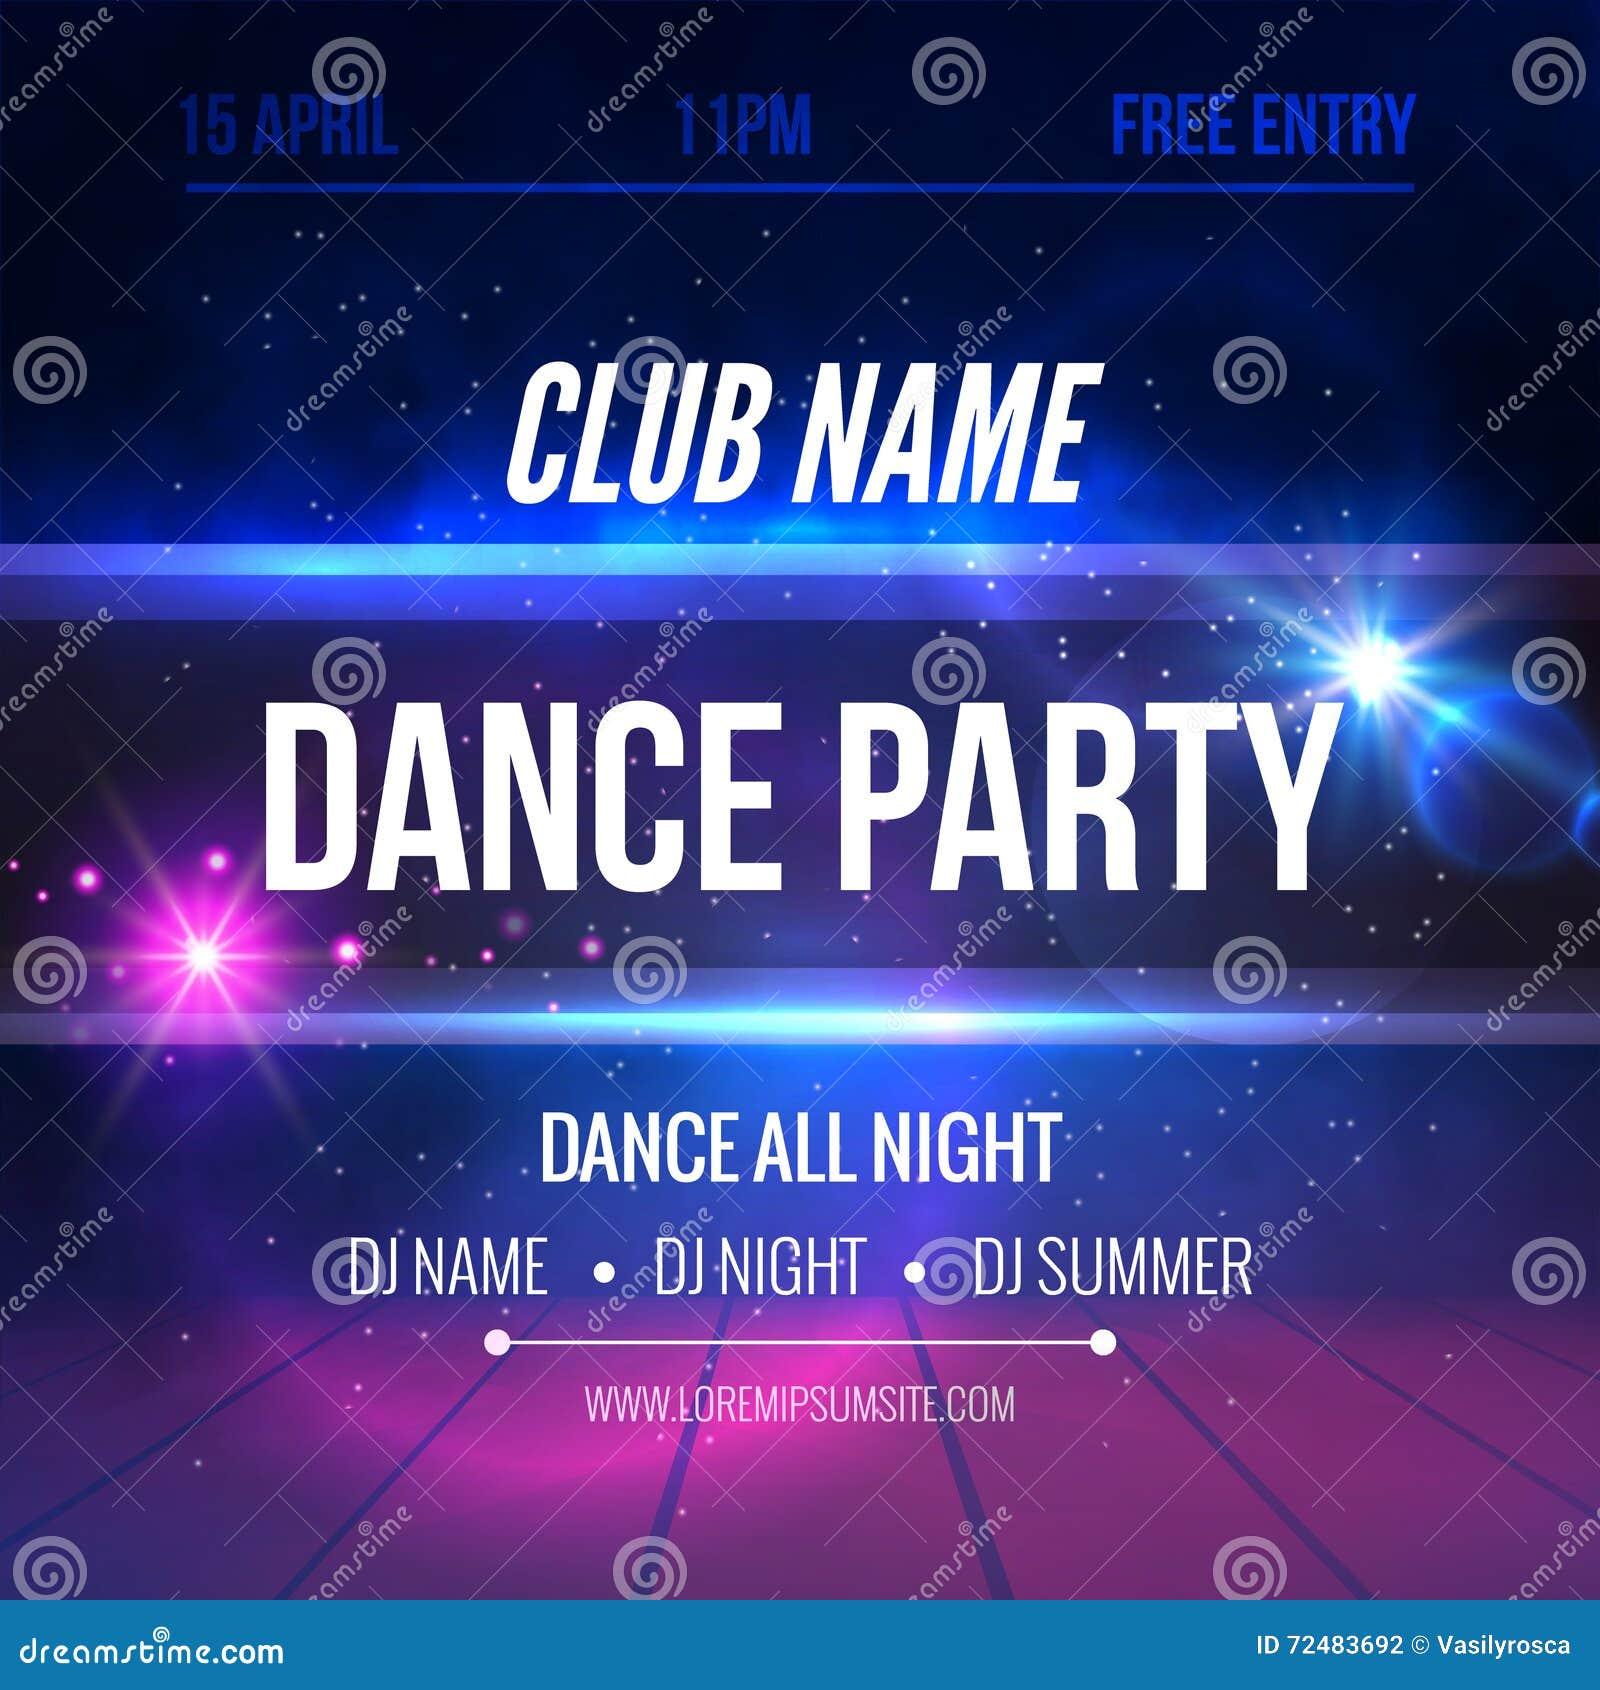 Night Dance Party Poster Background Template Festival Vector Mockup Stock Vector Illustration Of Creative Concert 72483692,Free T Shirt Design Maker